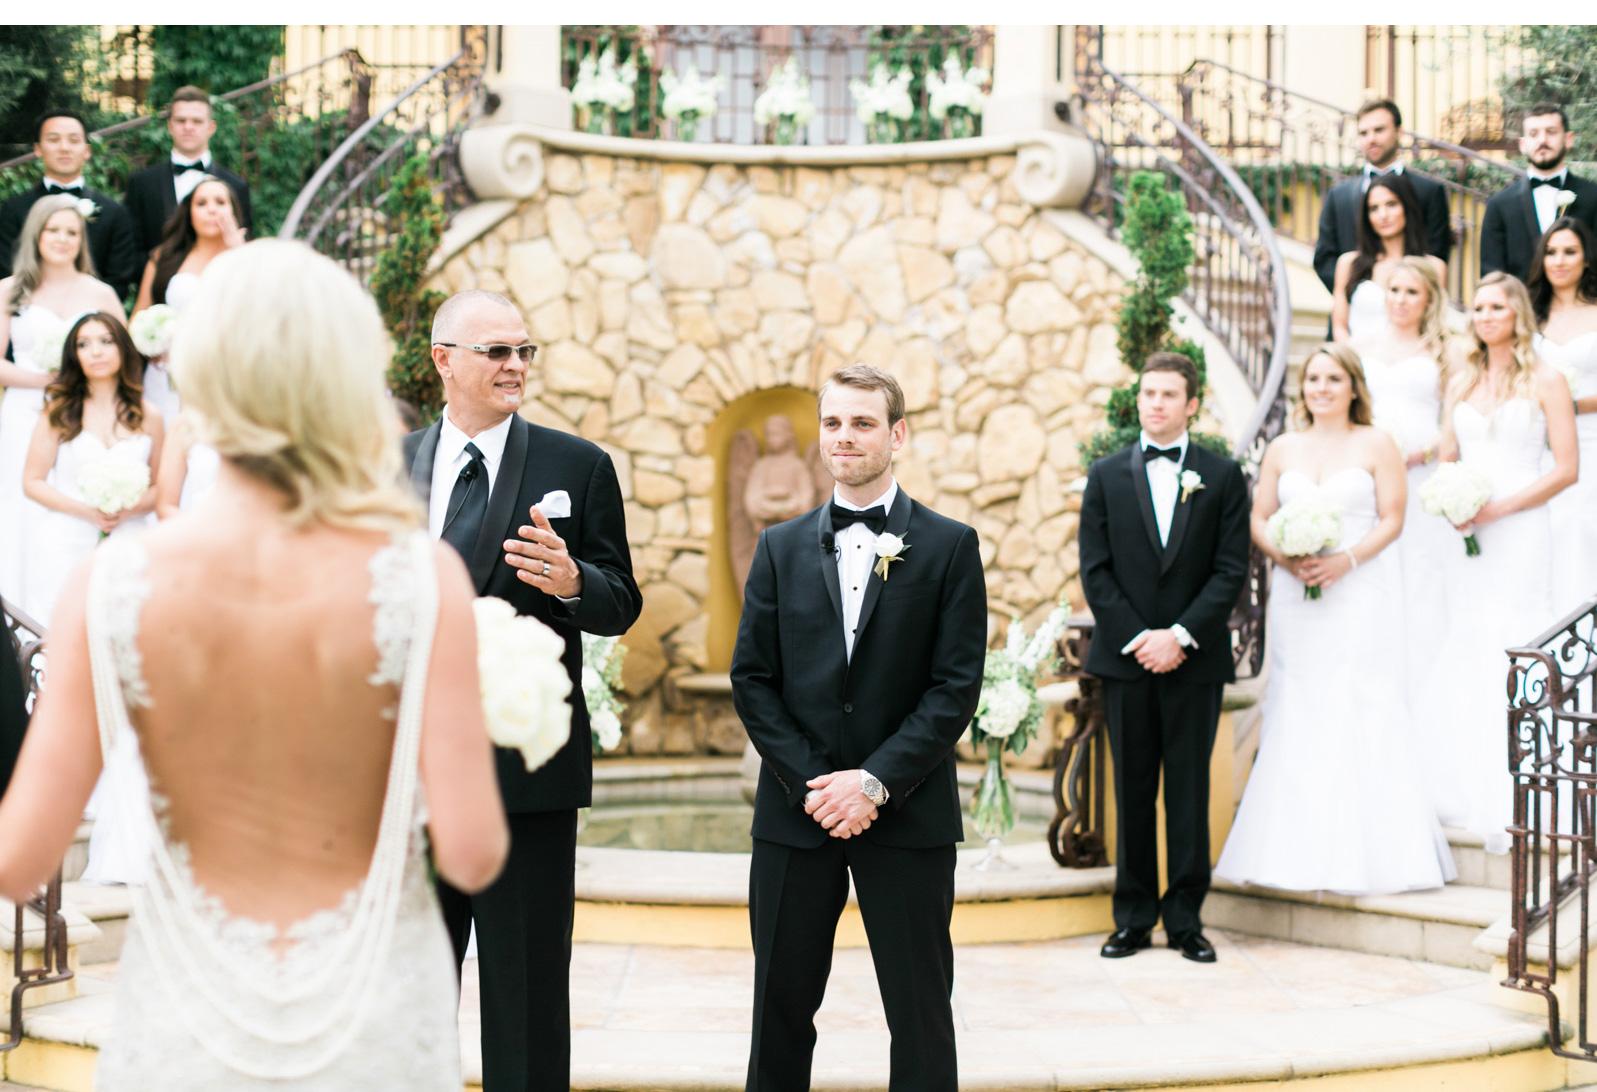 Southern-California-Wedding-Photographer-Natalie-Schutt-Photography_19.jpg